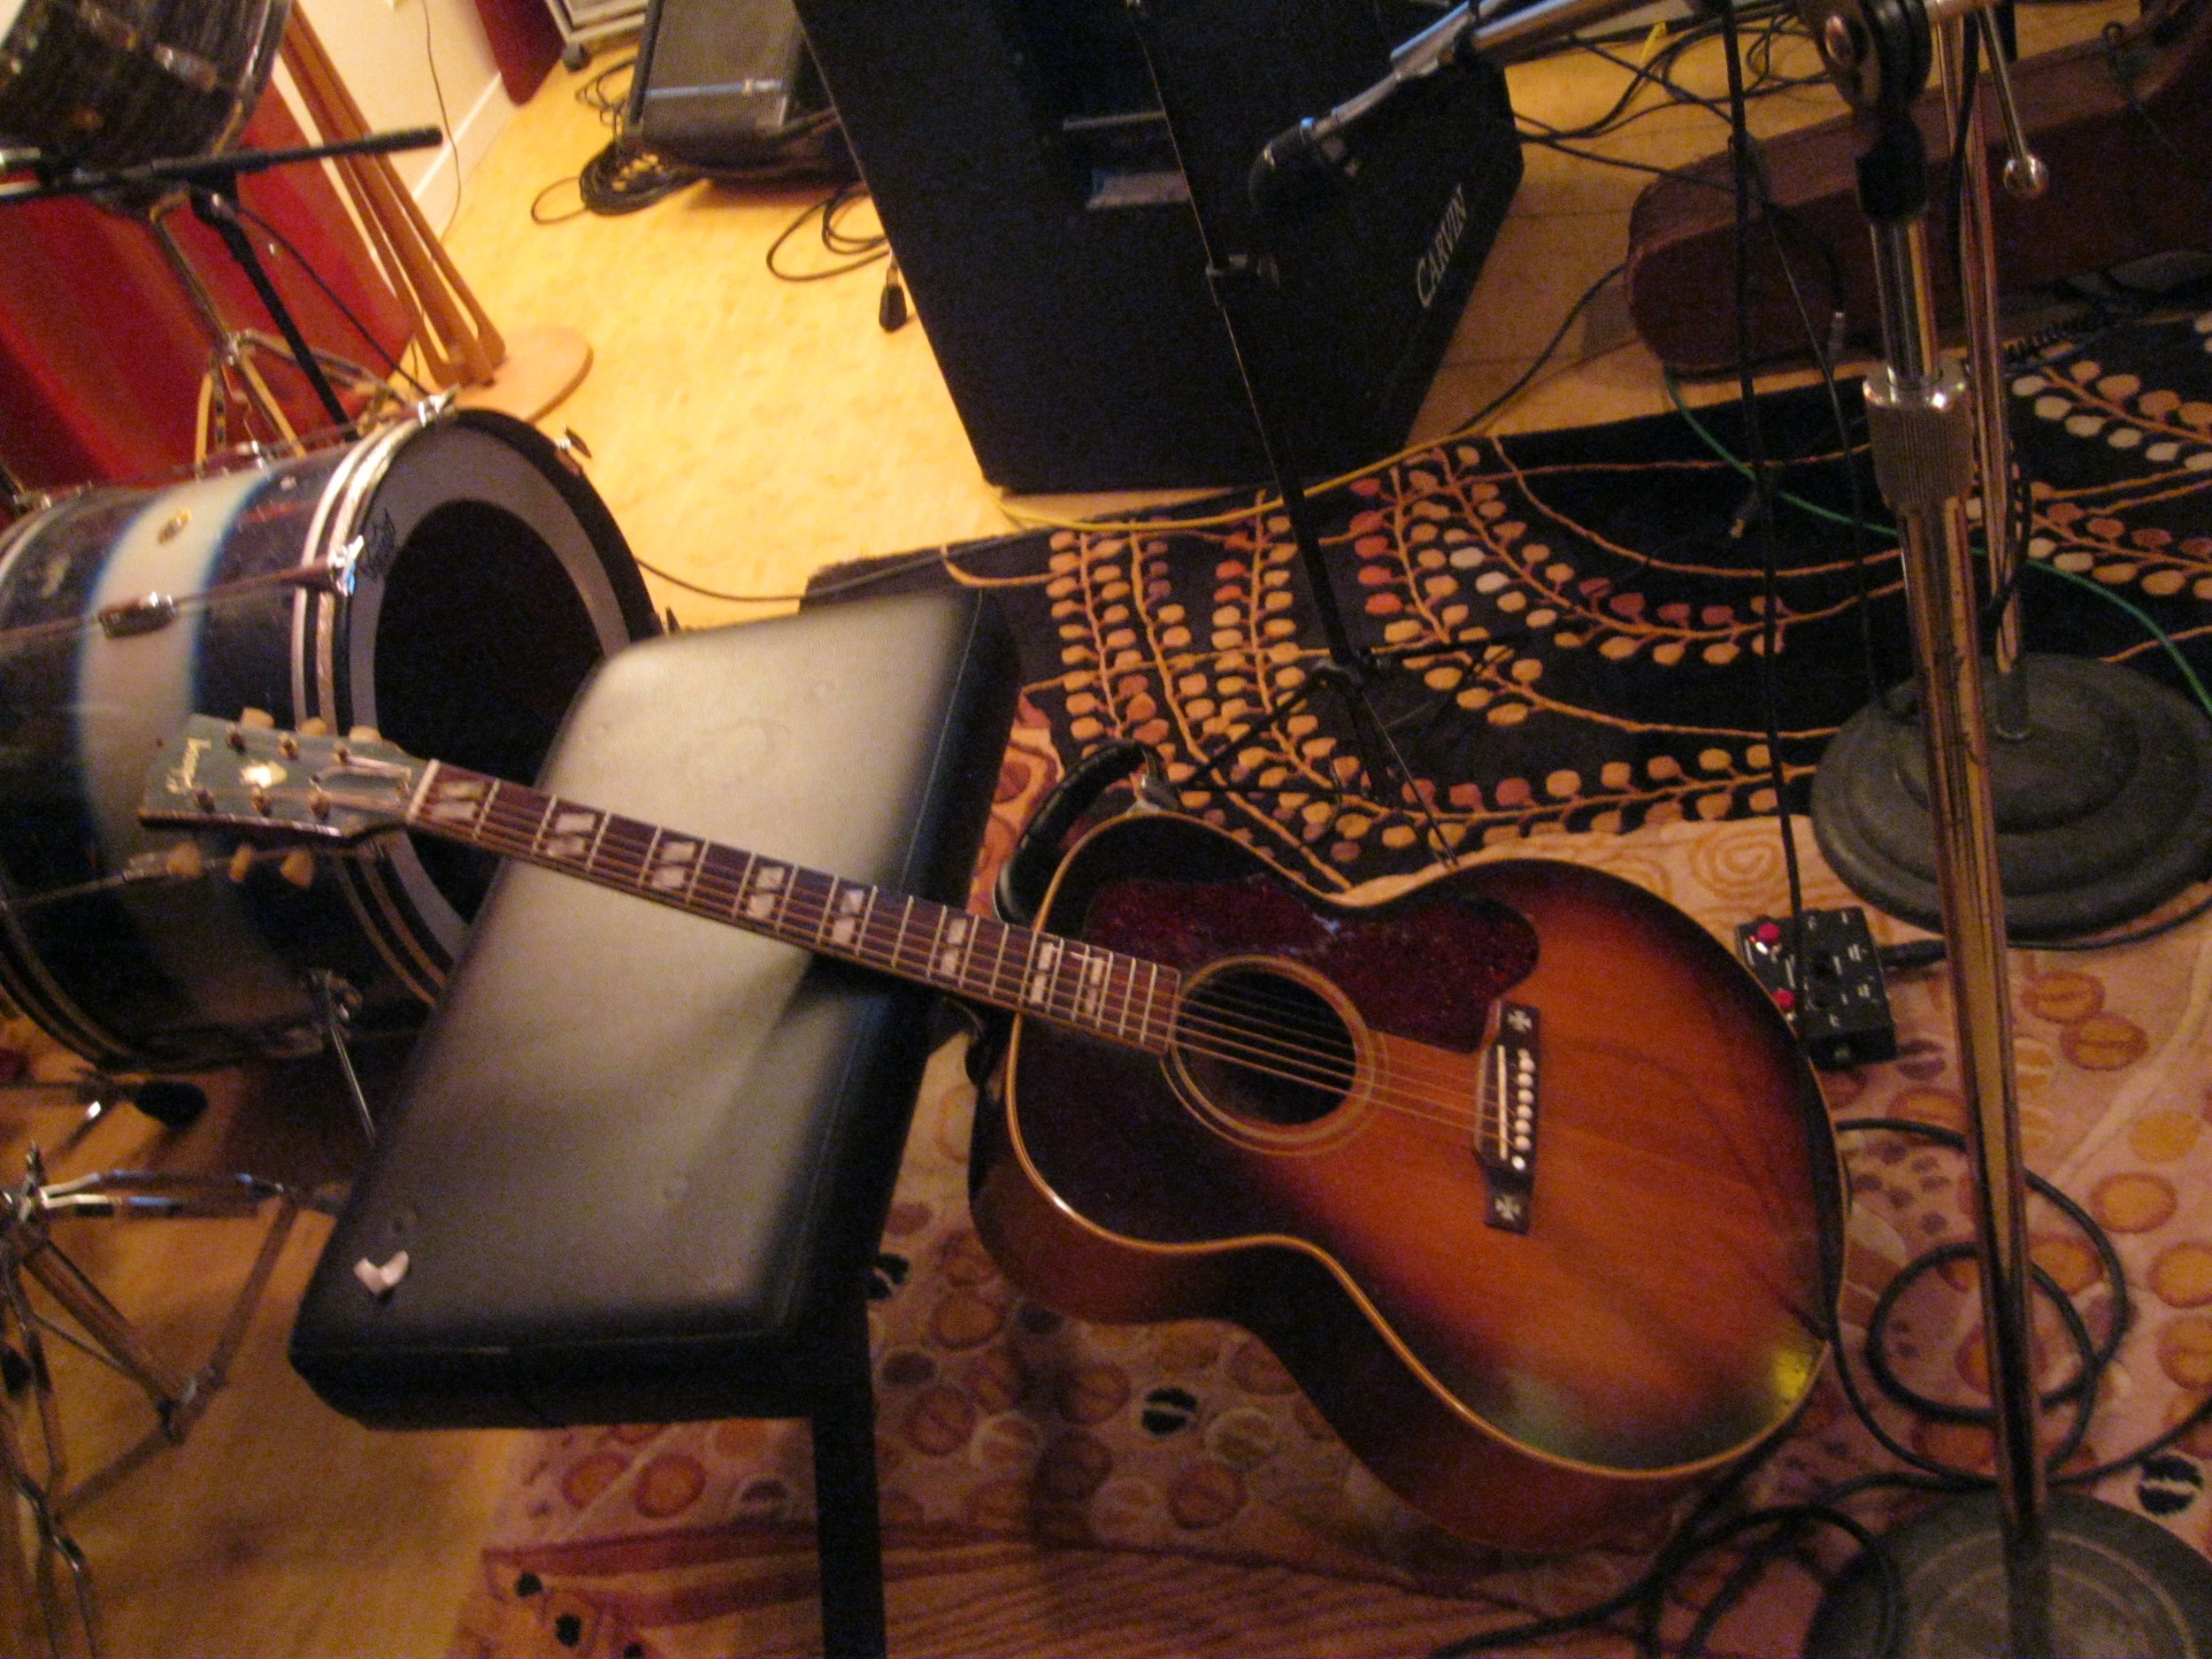 James Clem's 1952 Gibson J-185 guitar.